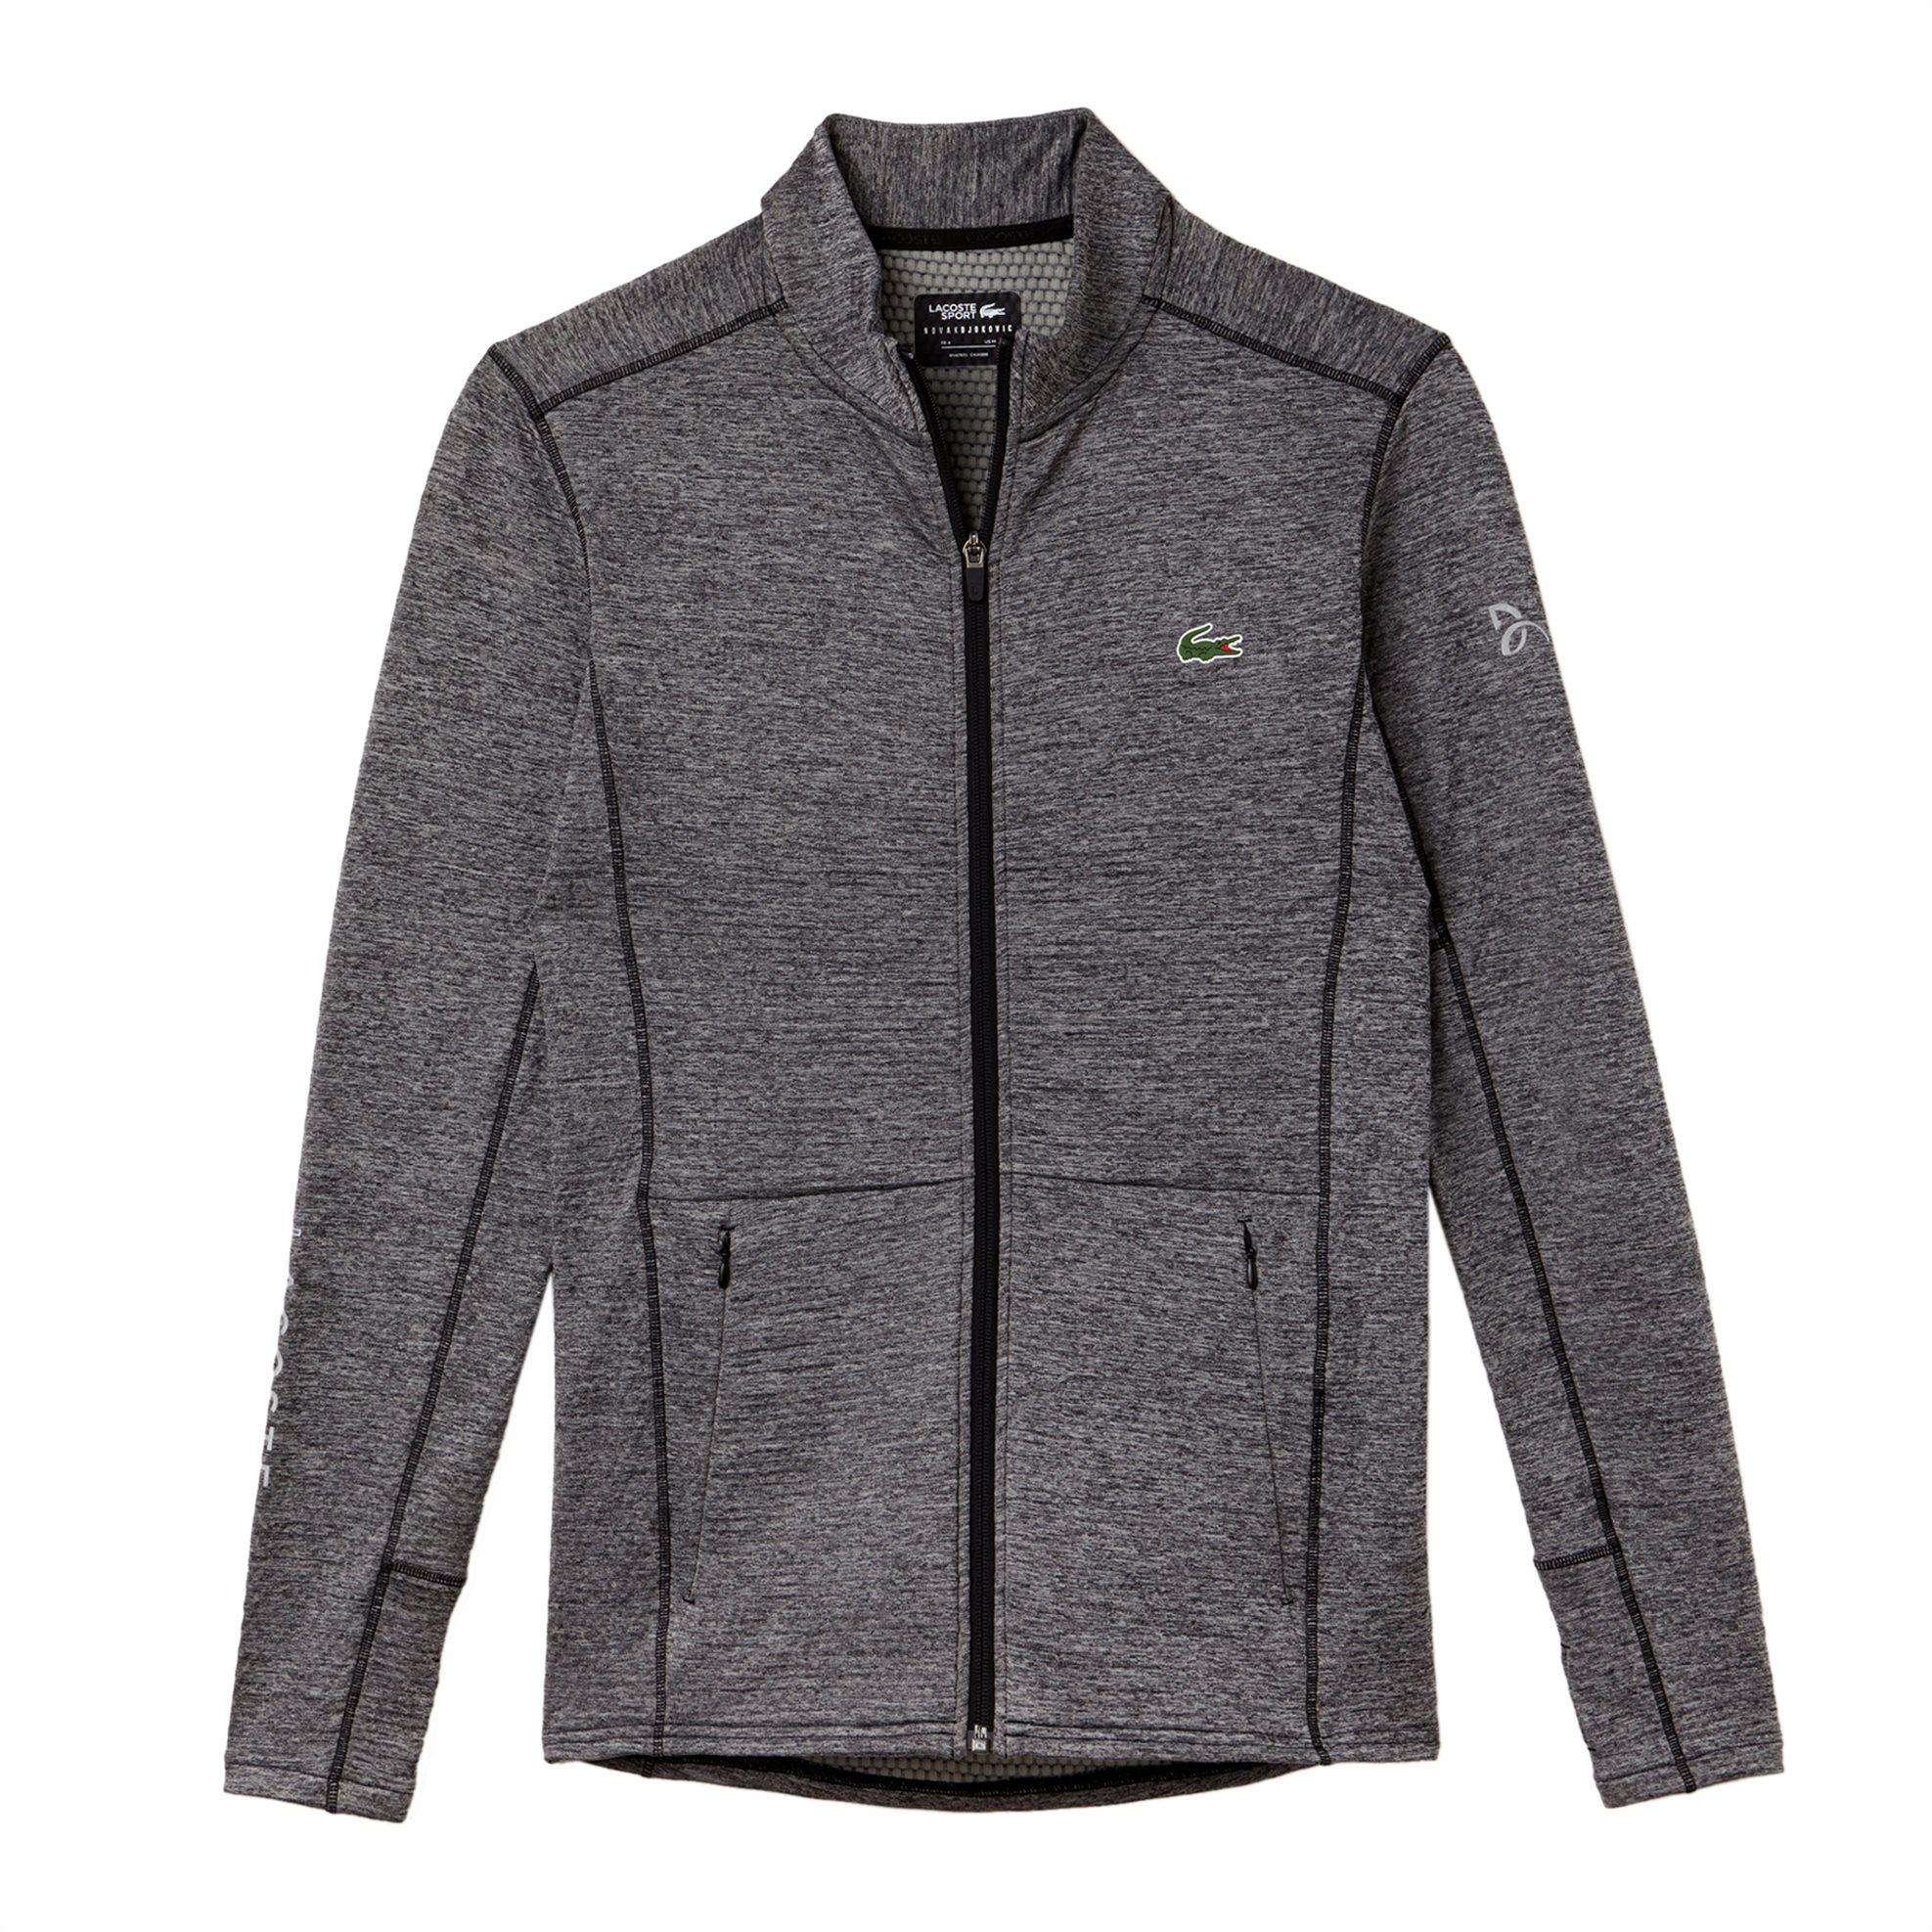 Lacoste ανδρική ζακέτα φούτερ μονόχρωμη με slit τσέπες Novak Djokovic Collection ανδρασ   ρουχα   μπλούζες   φούτερ μπλούζες   ζακέτες